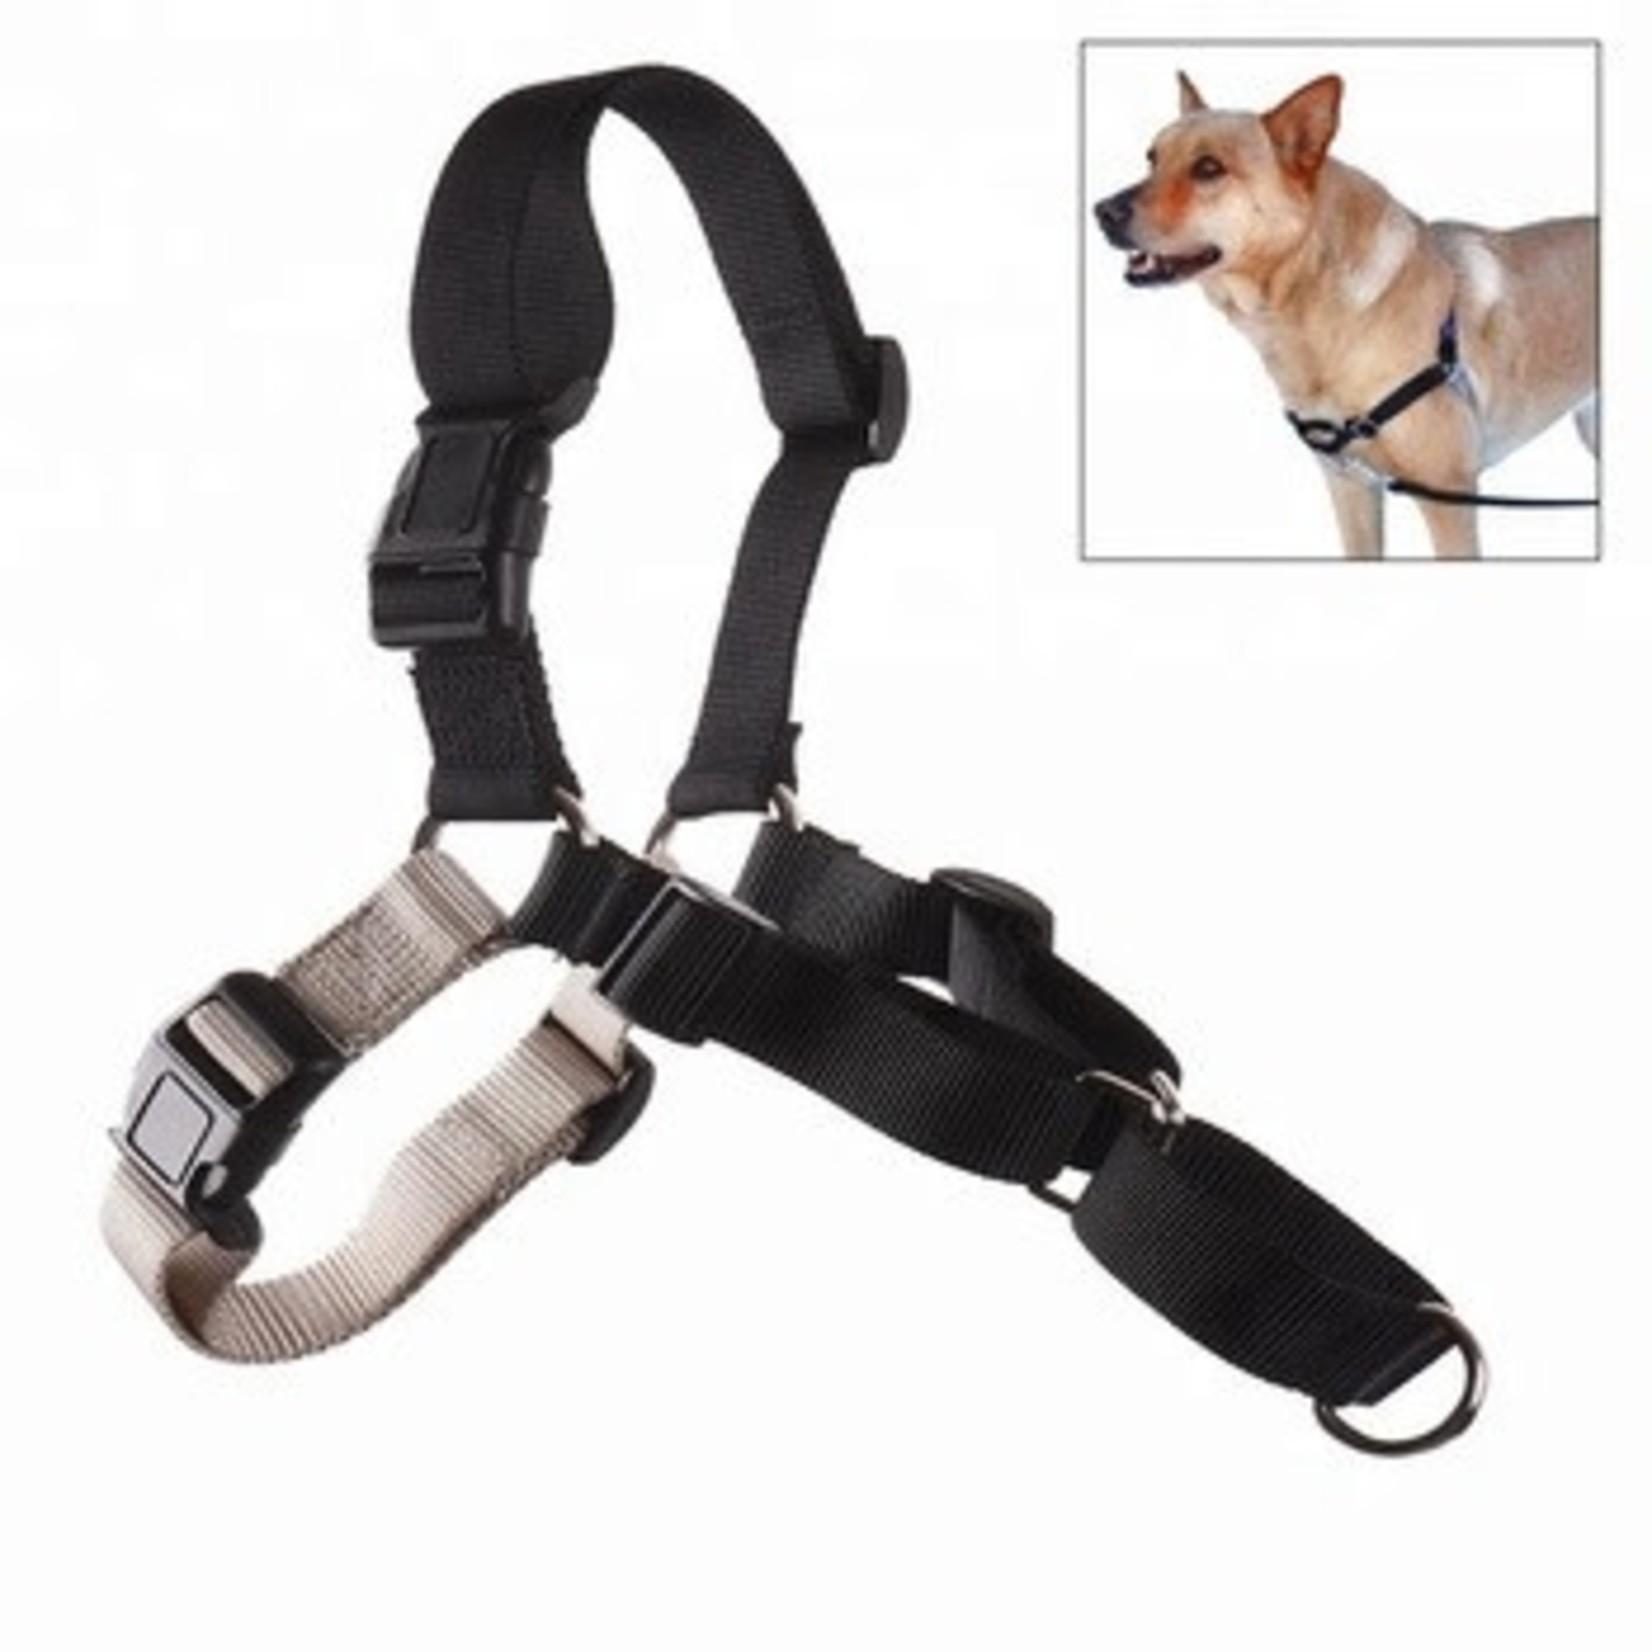 Pet Safe / Radio Systems Corp. Easy Walk Harness Black Medium